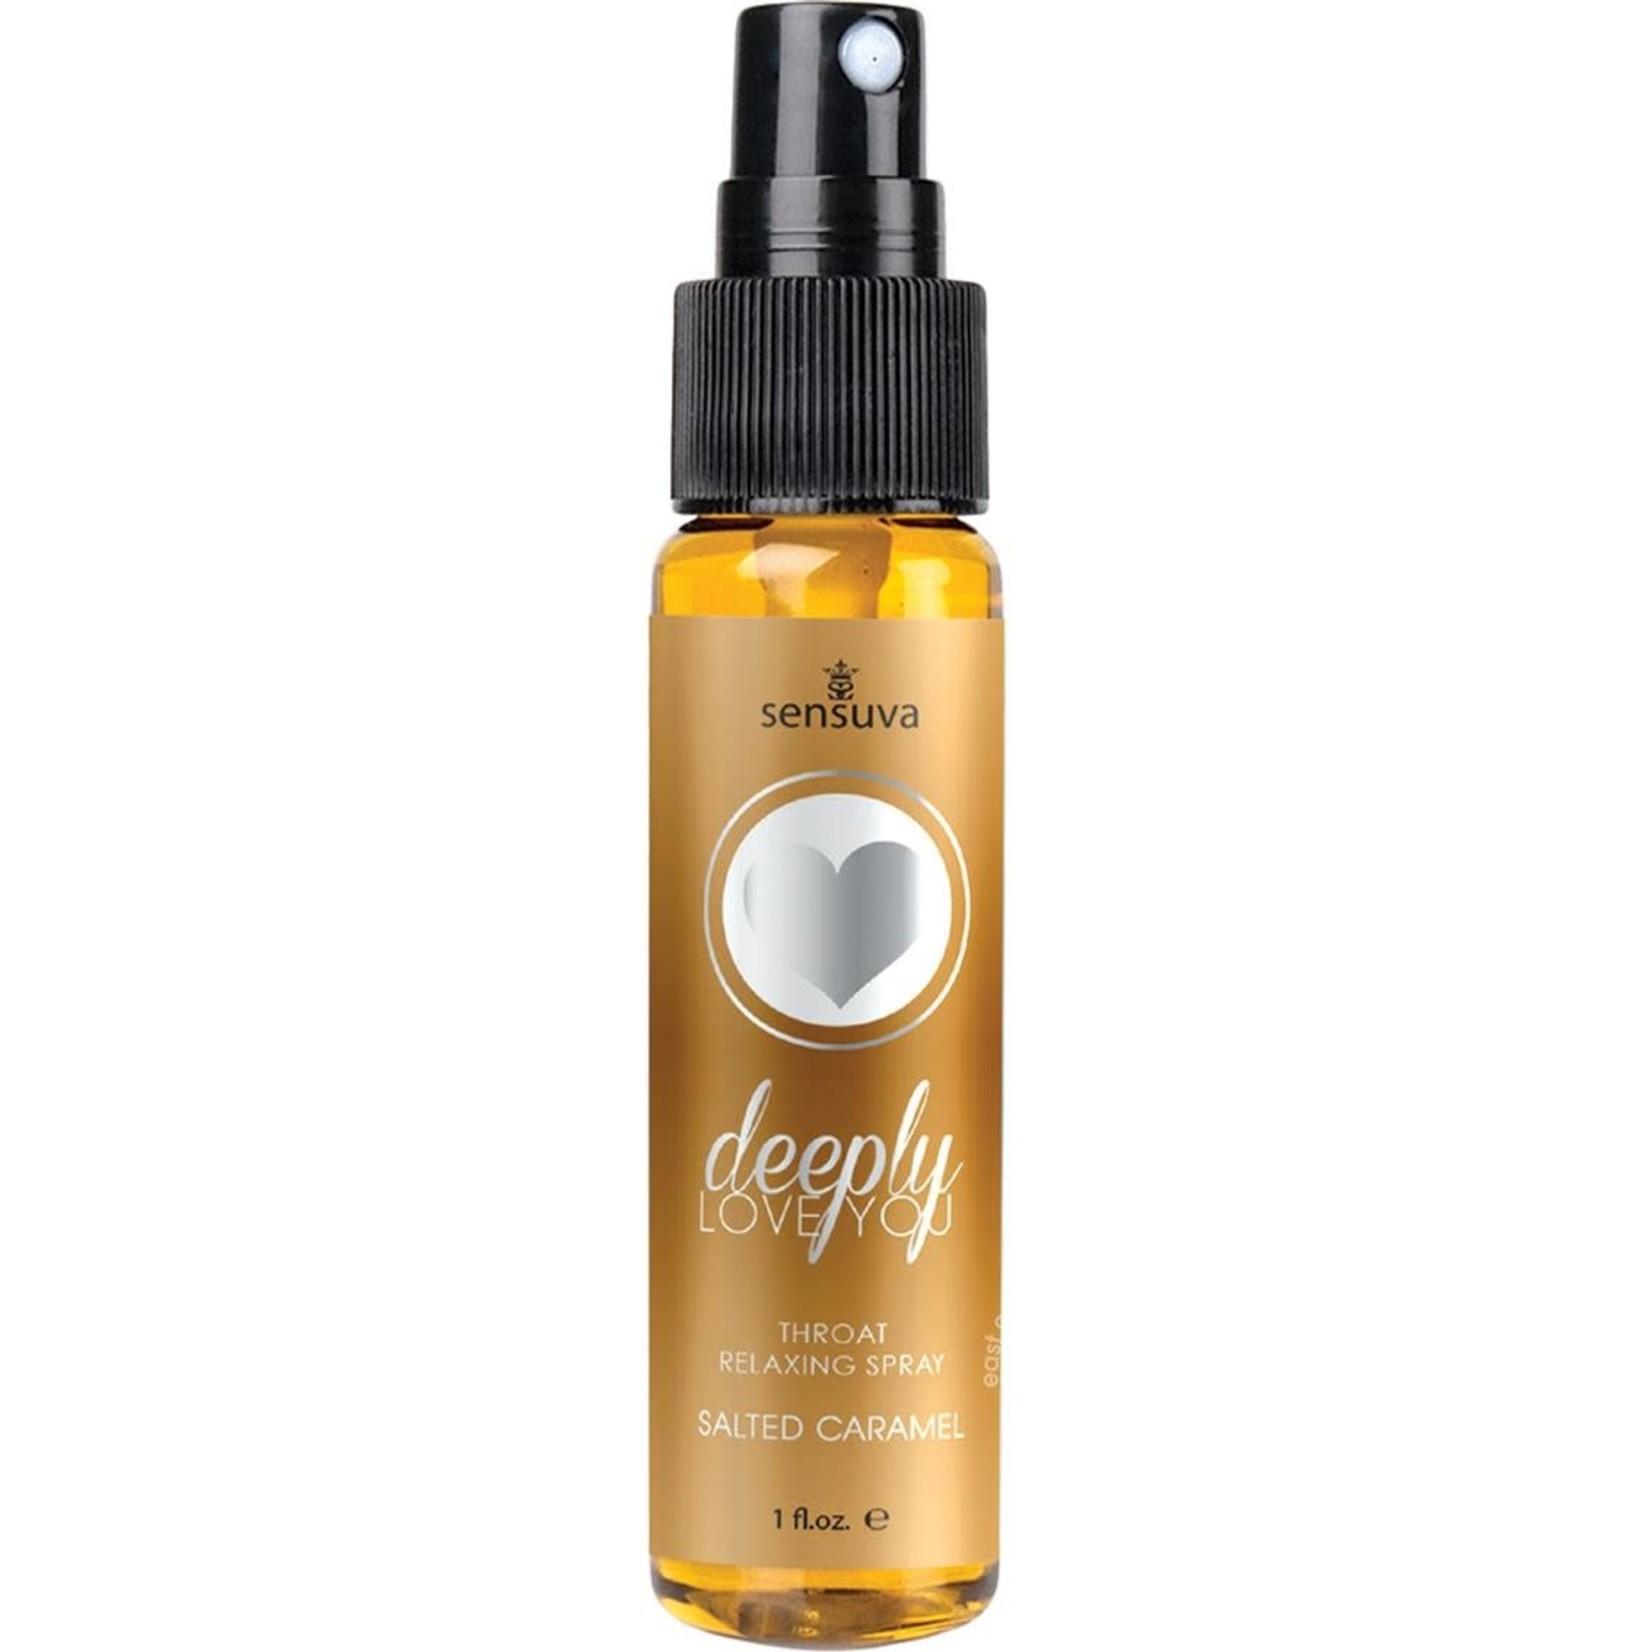 Deeply Love You Salted Caramel Throat Relaxing Spray 1 fl.oz. Bottle